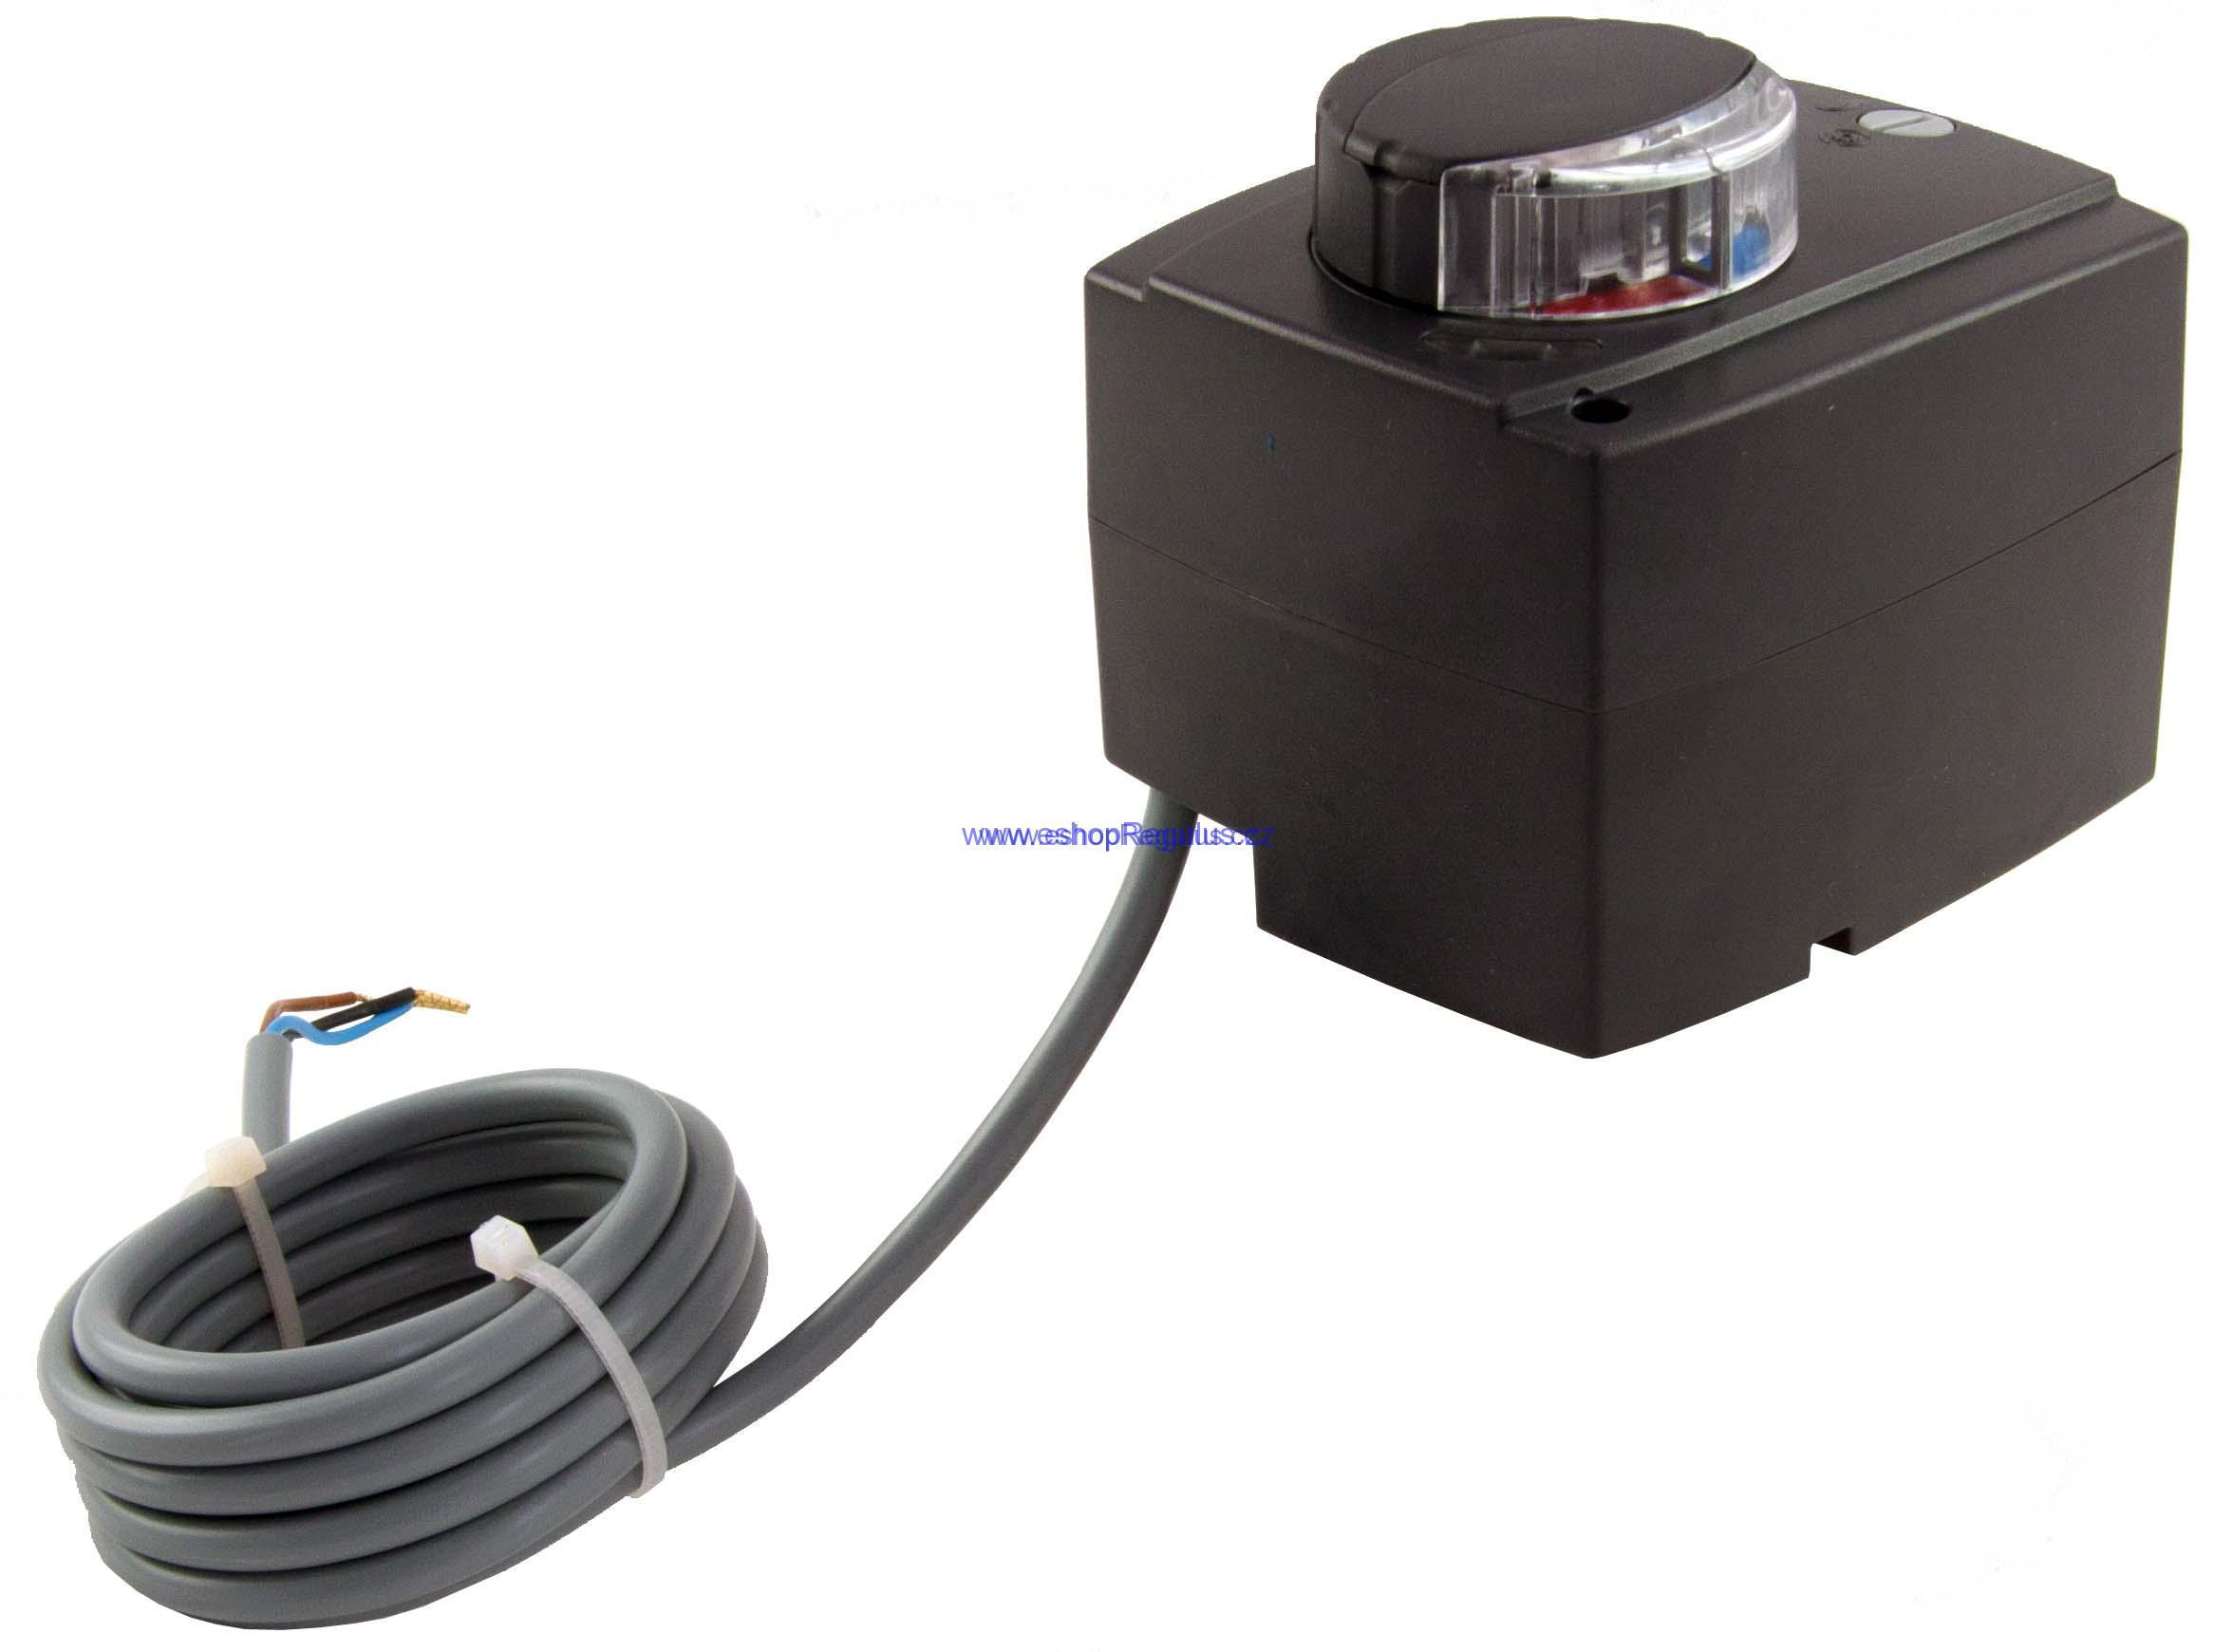 Pohon 24V pro LK840, LK841 - 60-120s, 5 Nm